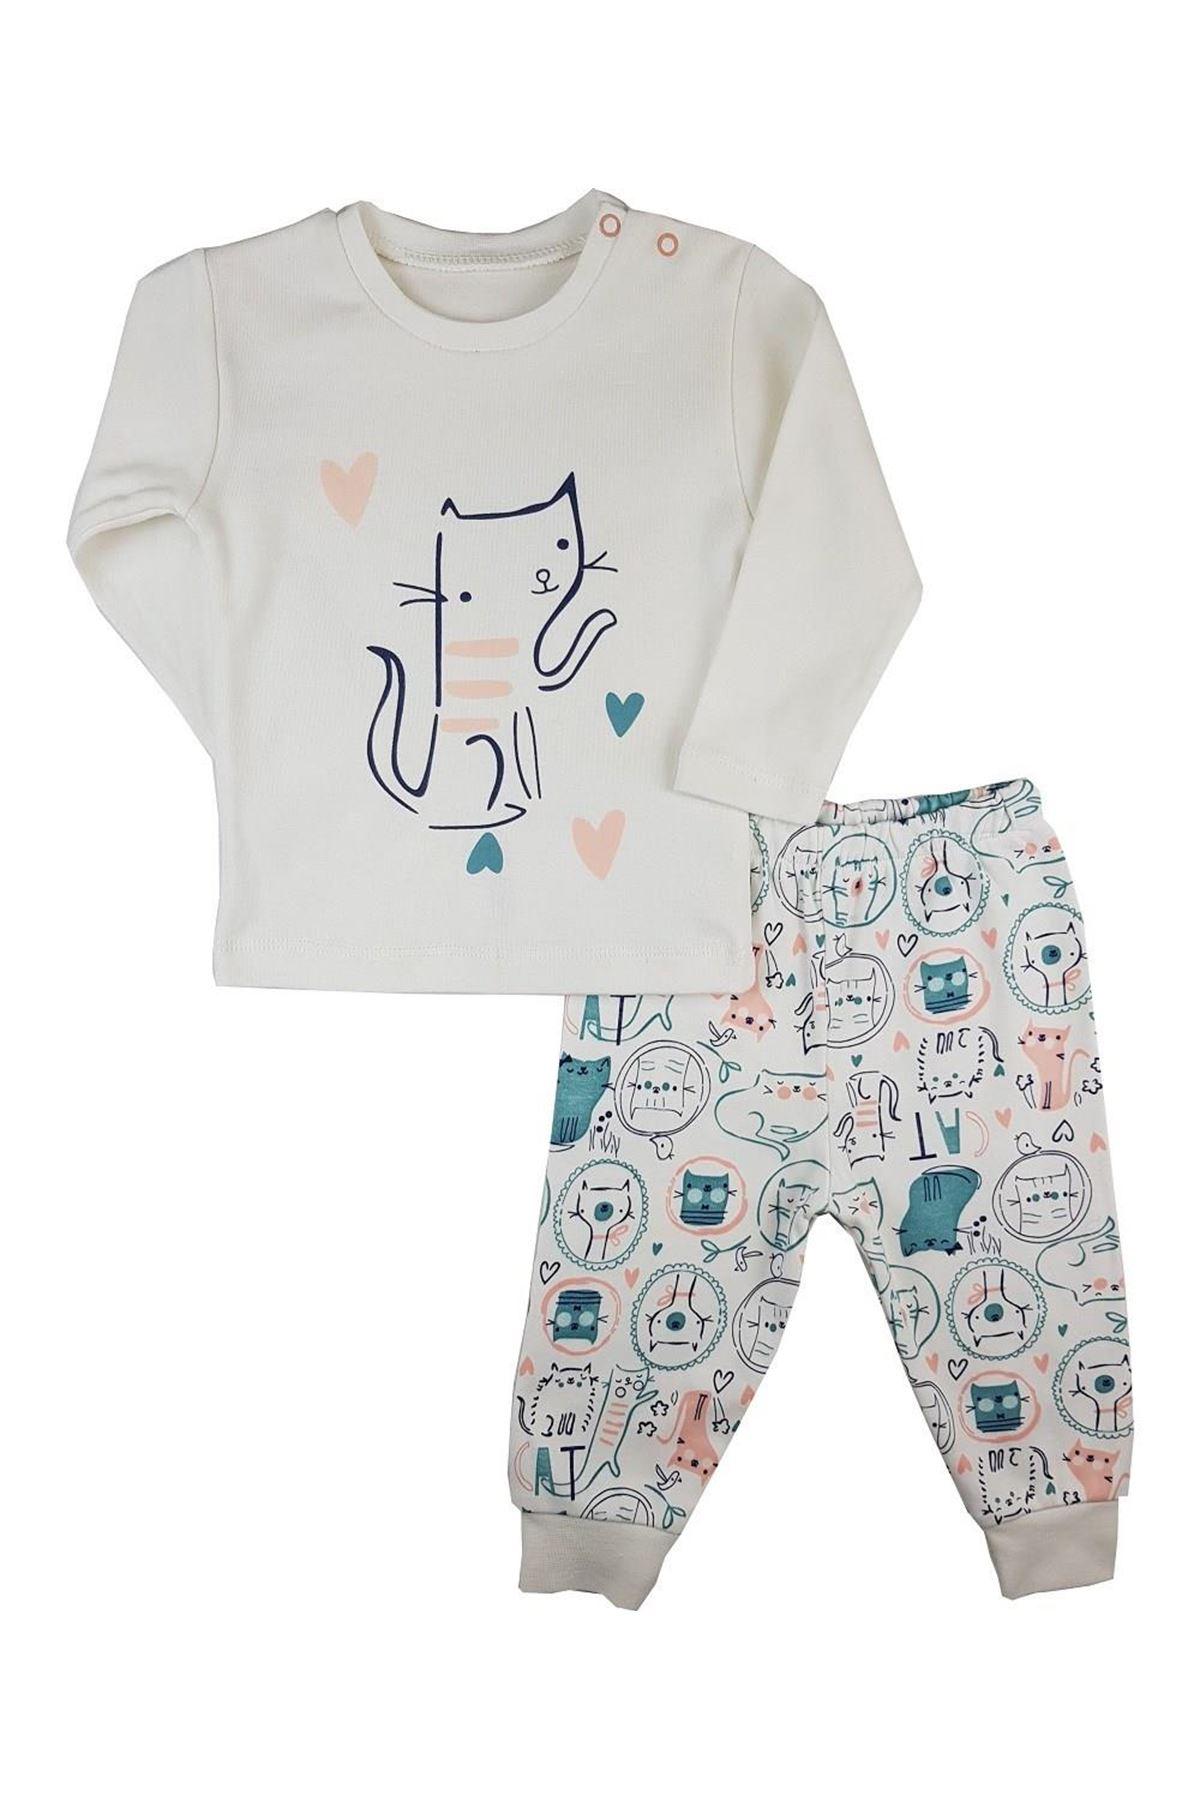 Luggi Baby Cute Cat Bebek Pijama Takım LG-6421 Karışık Renkli